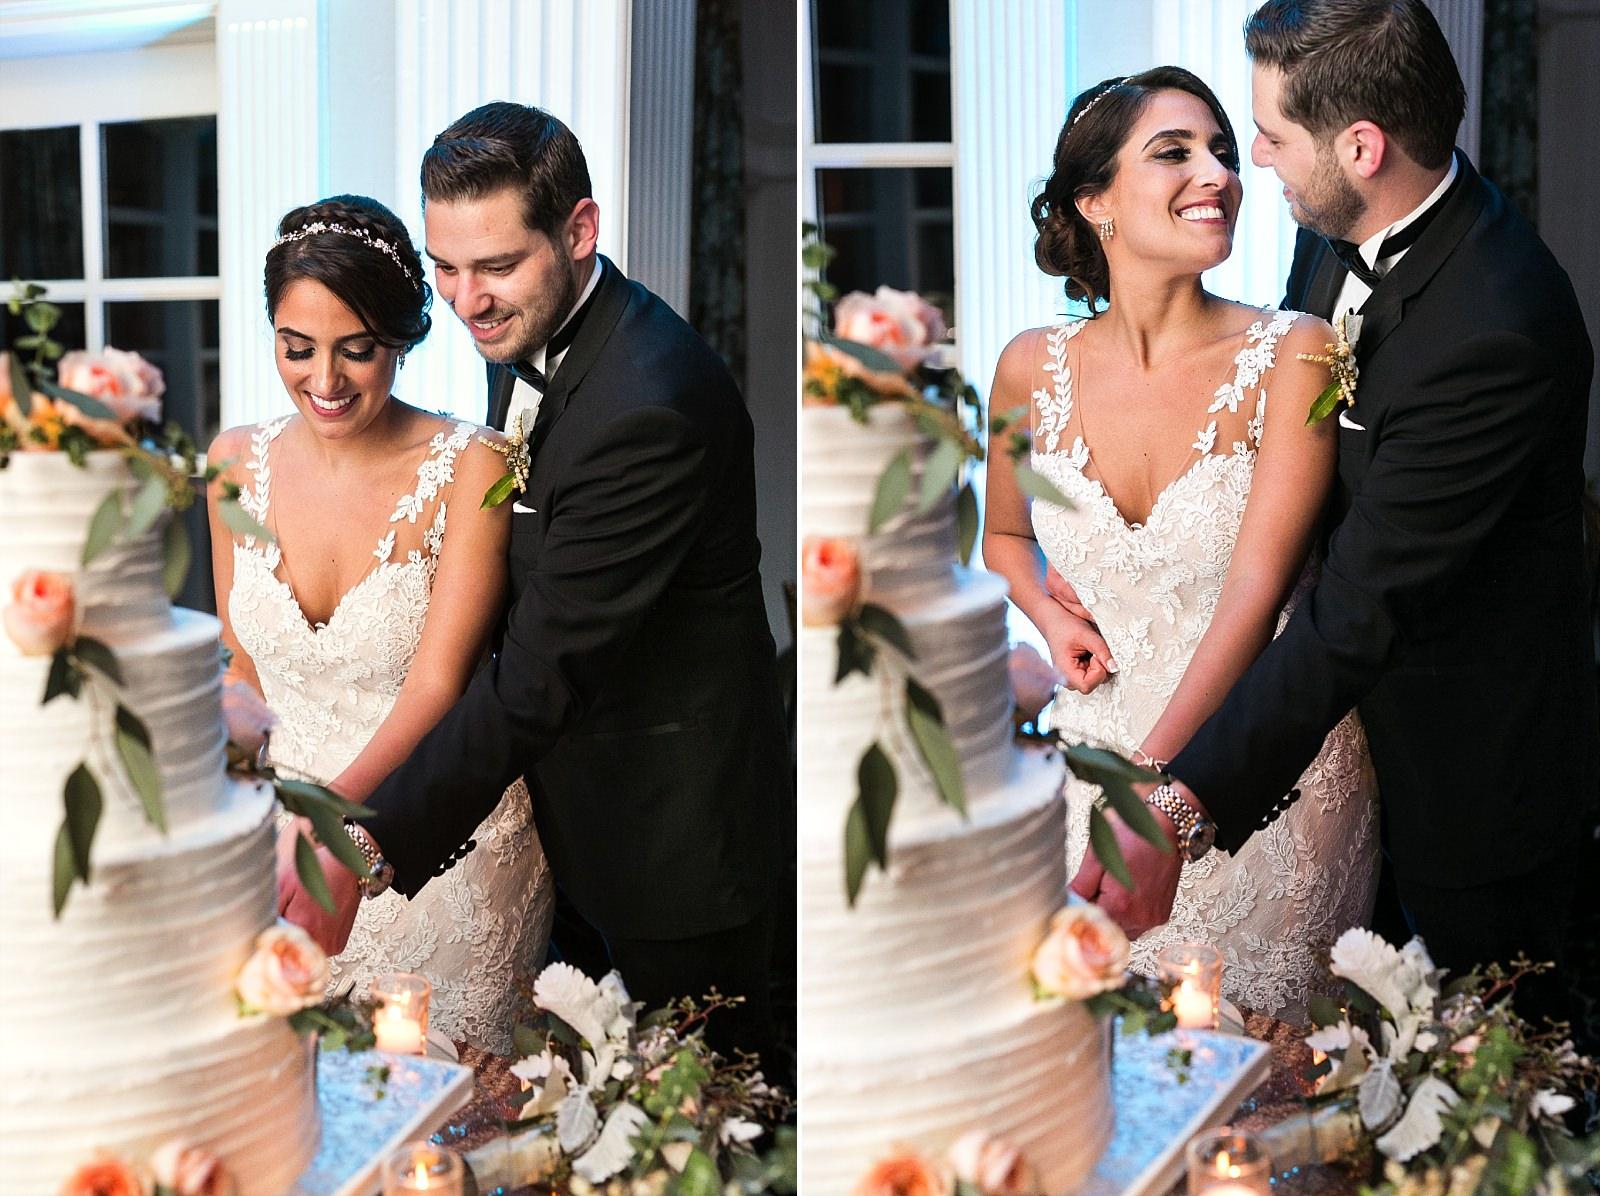 NY_Wedding_Photographer_NiPe_44.jpg